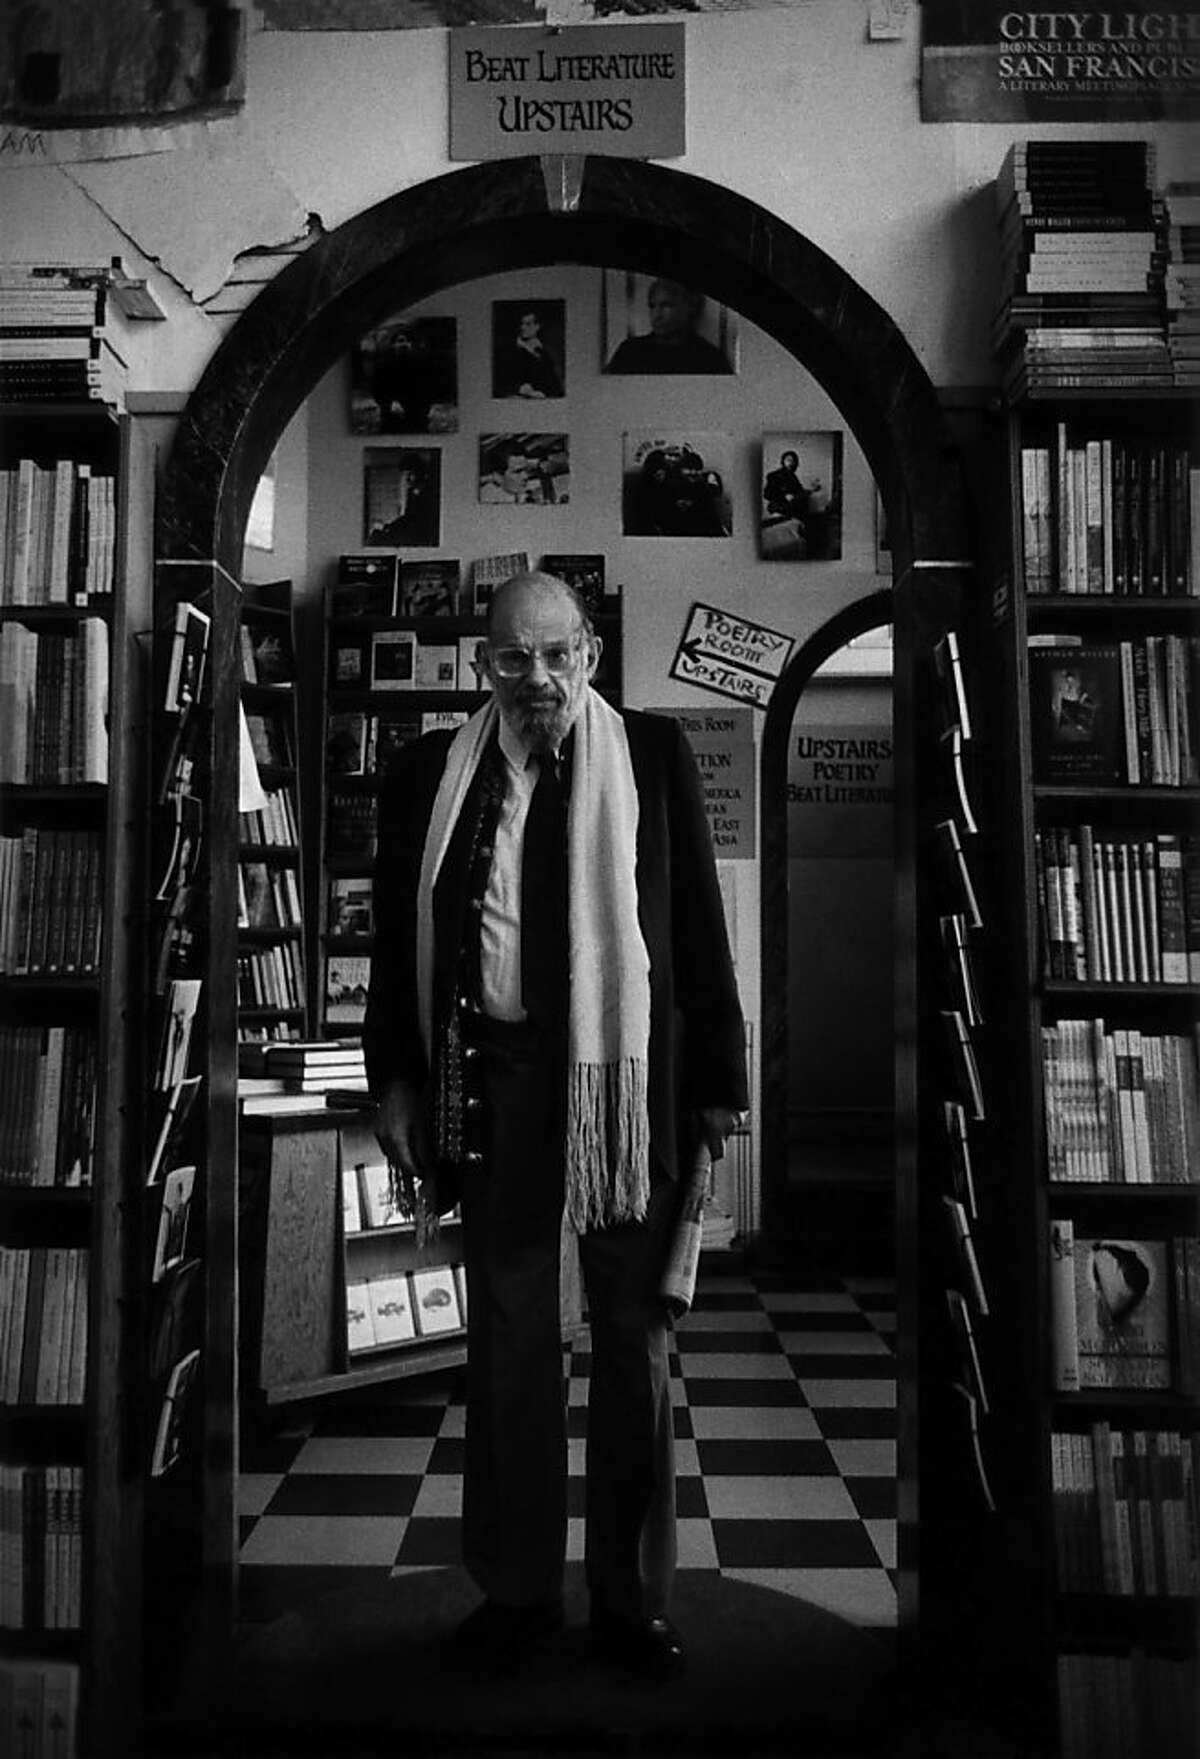 Christopher Felver, Allen s Last Visit to City Lights. Copyright 1997 Christopher Felver.